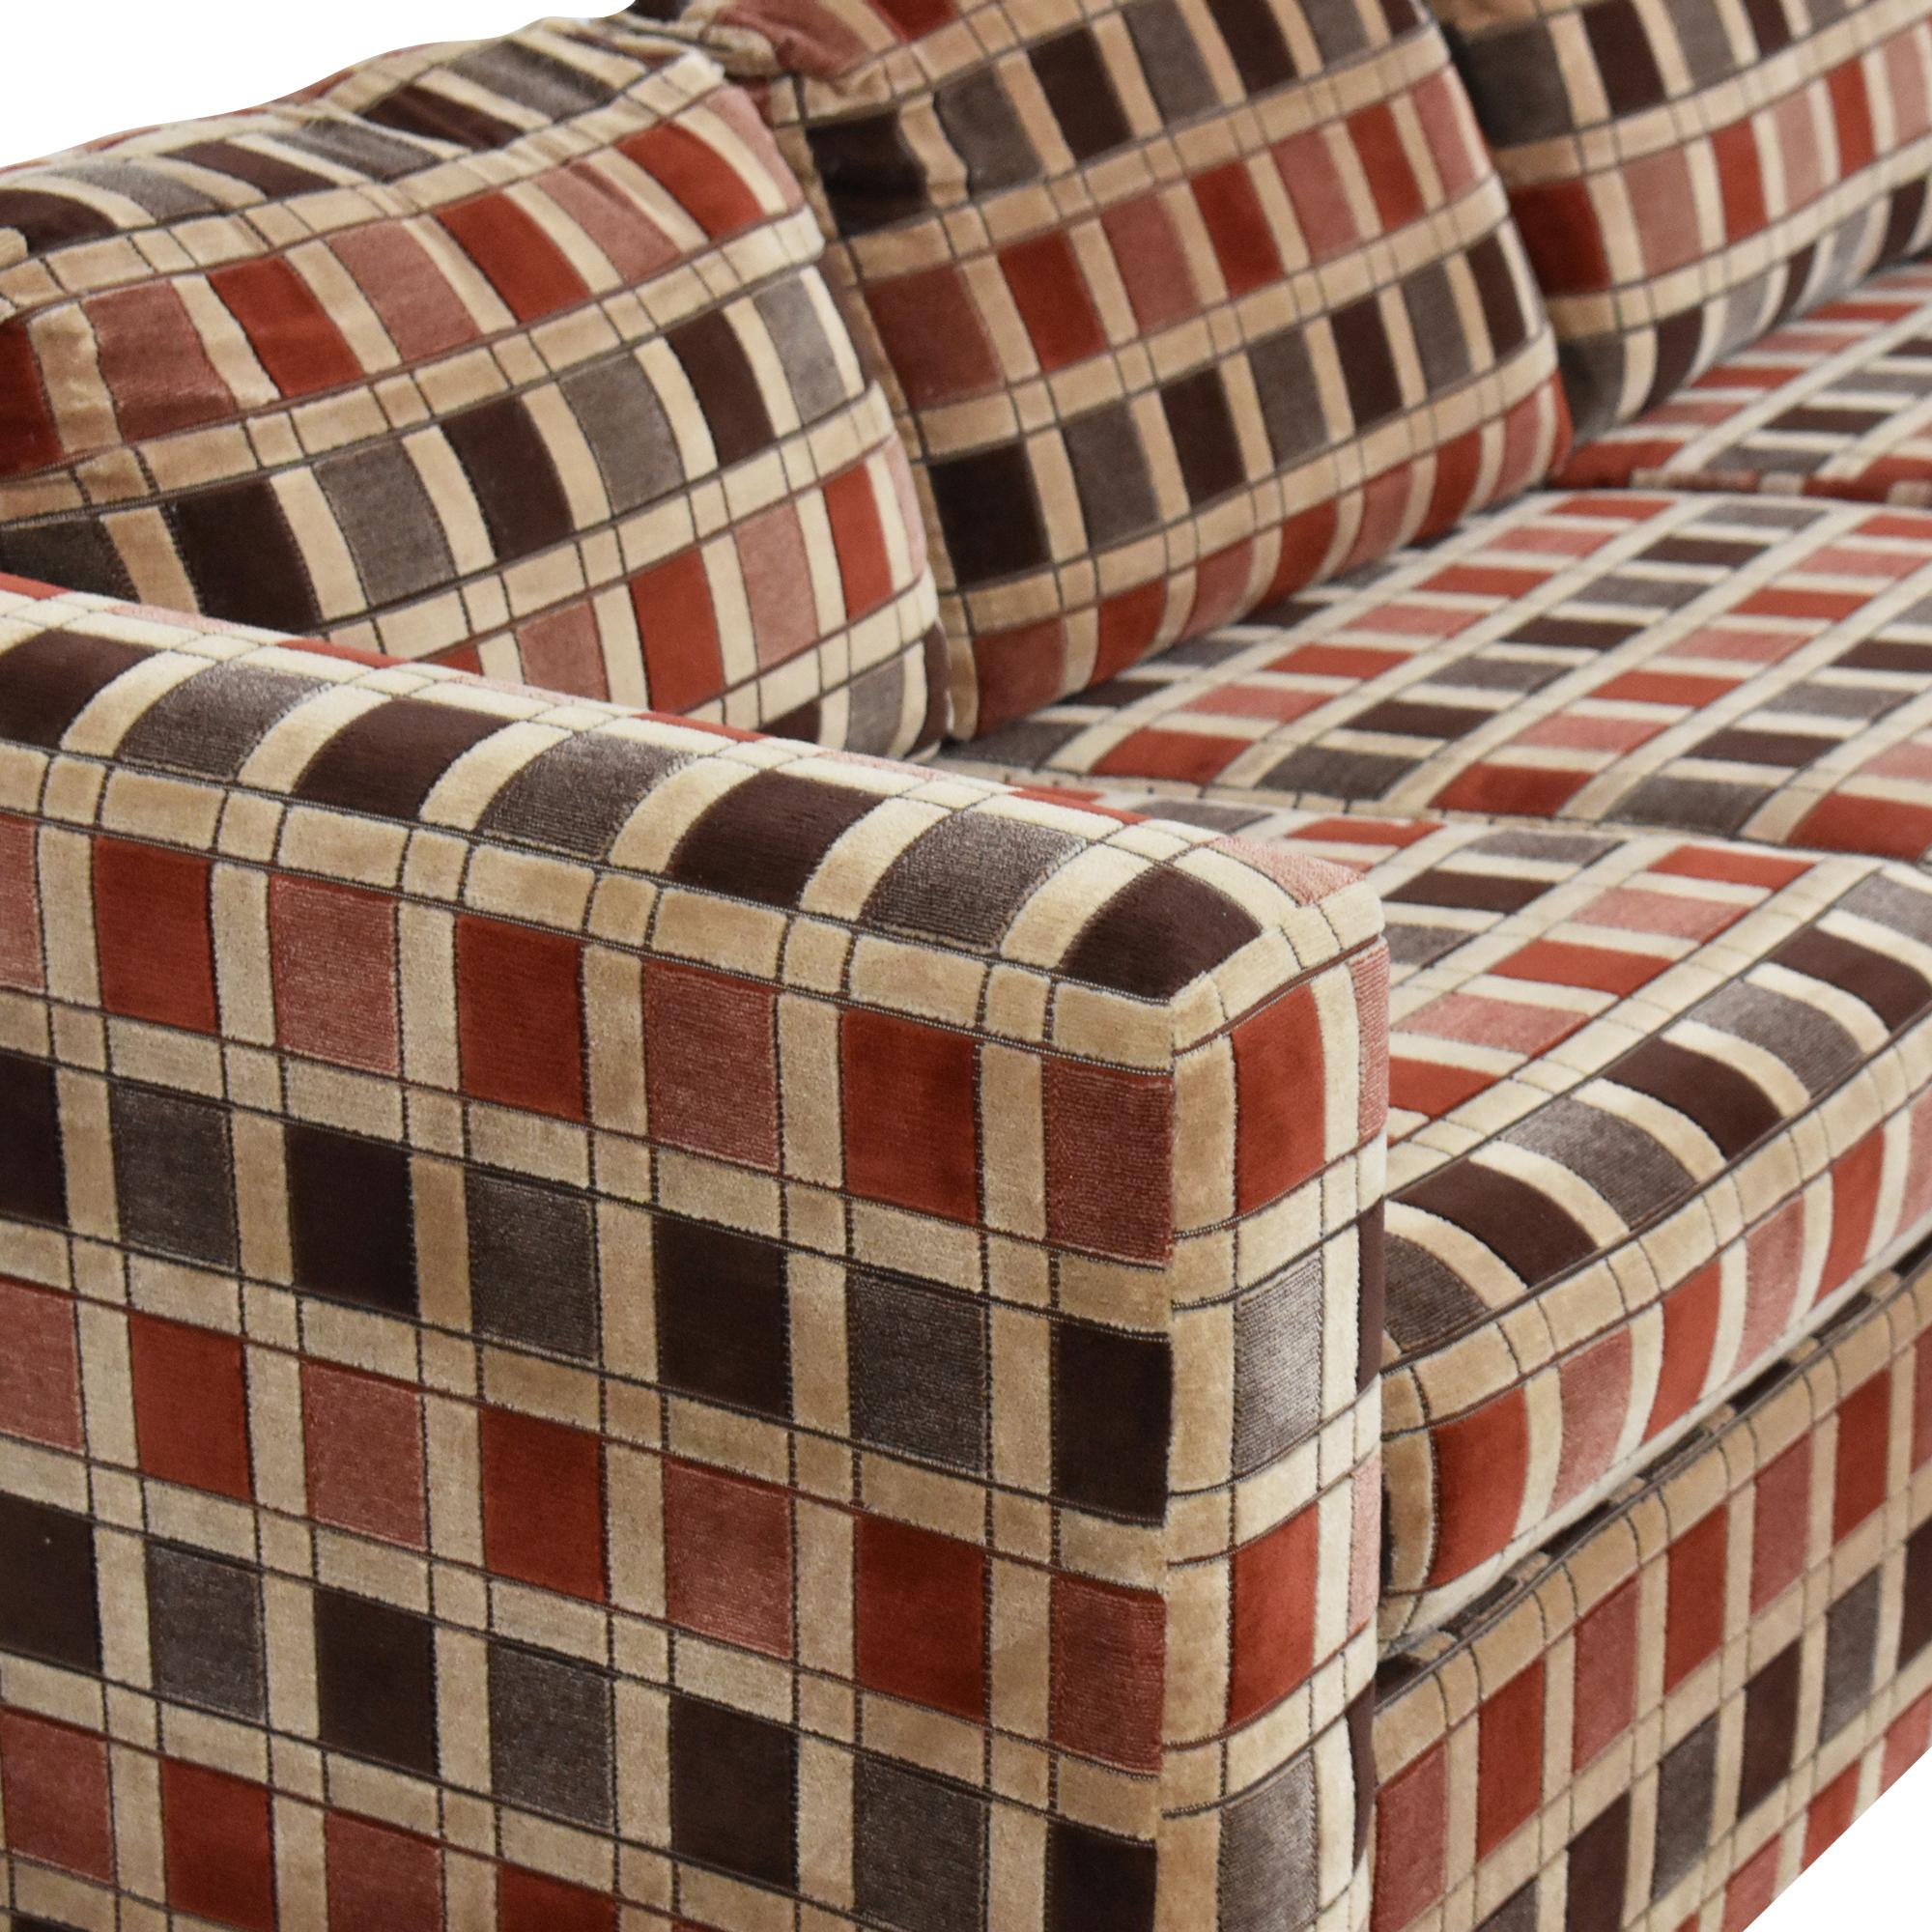 buy Duo-Sofas Sleeper Sofa  Sofa Beds